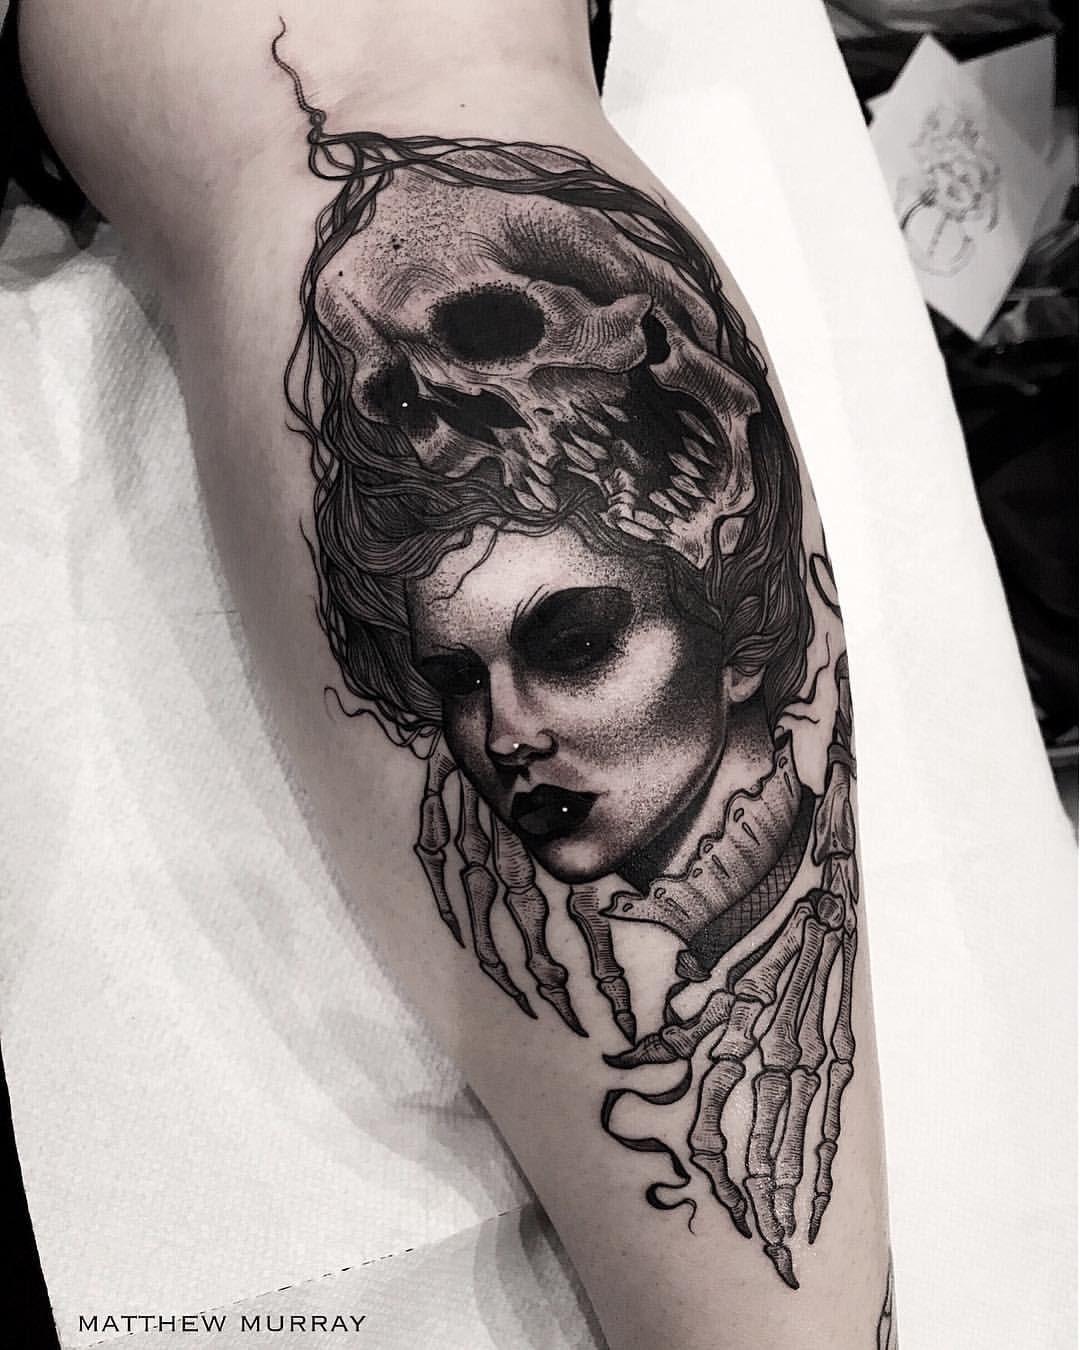 Small edgy tattoo ideas  likes  comments  matthew murray mattwmurray on